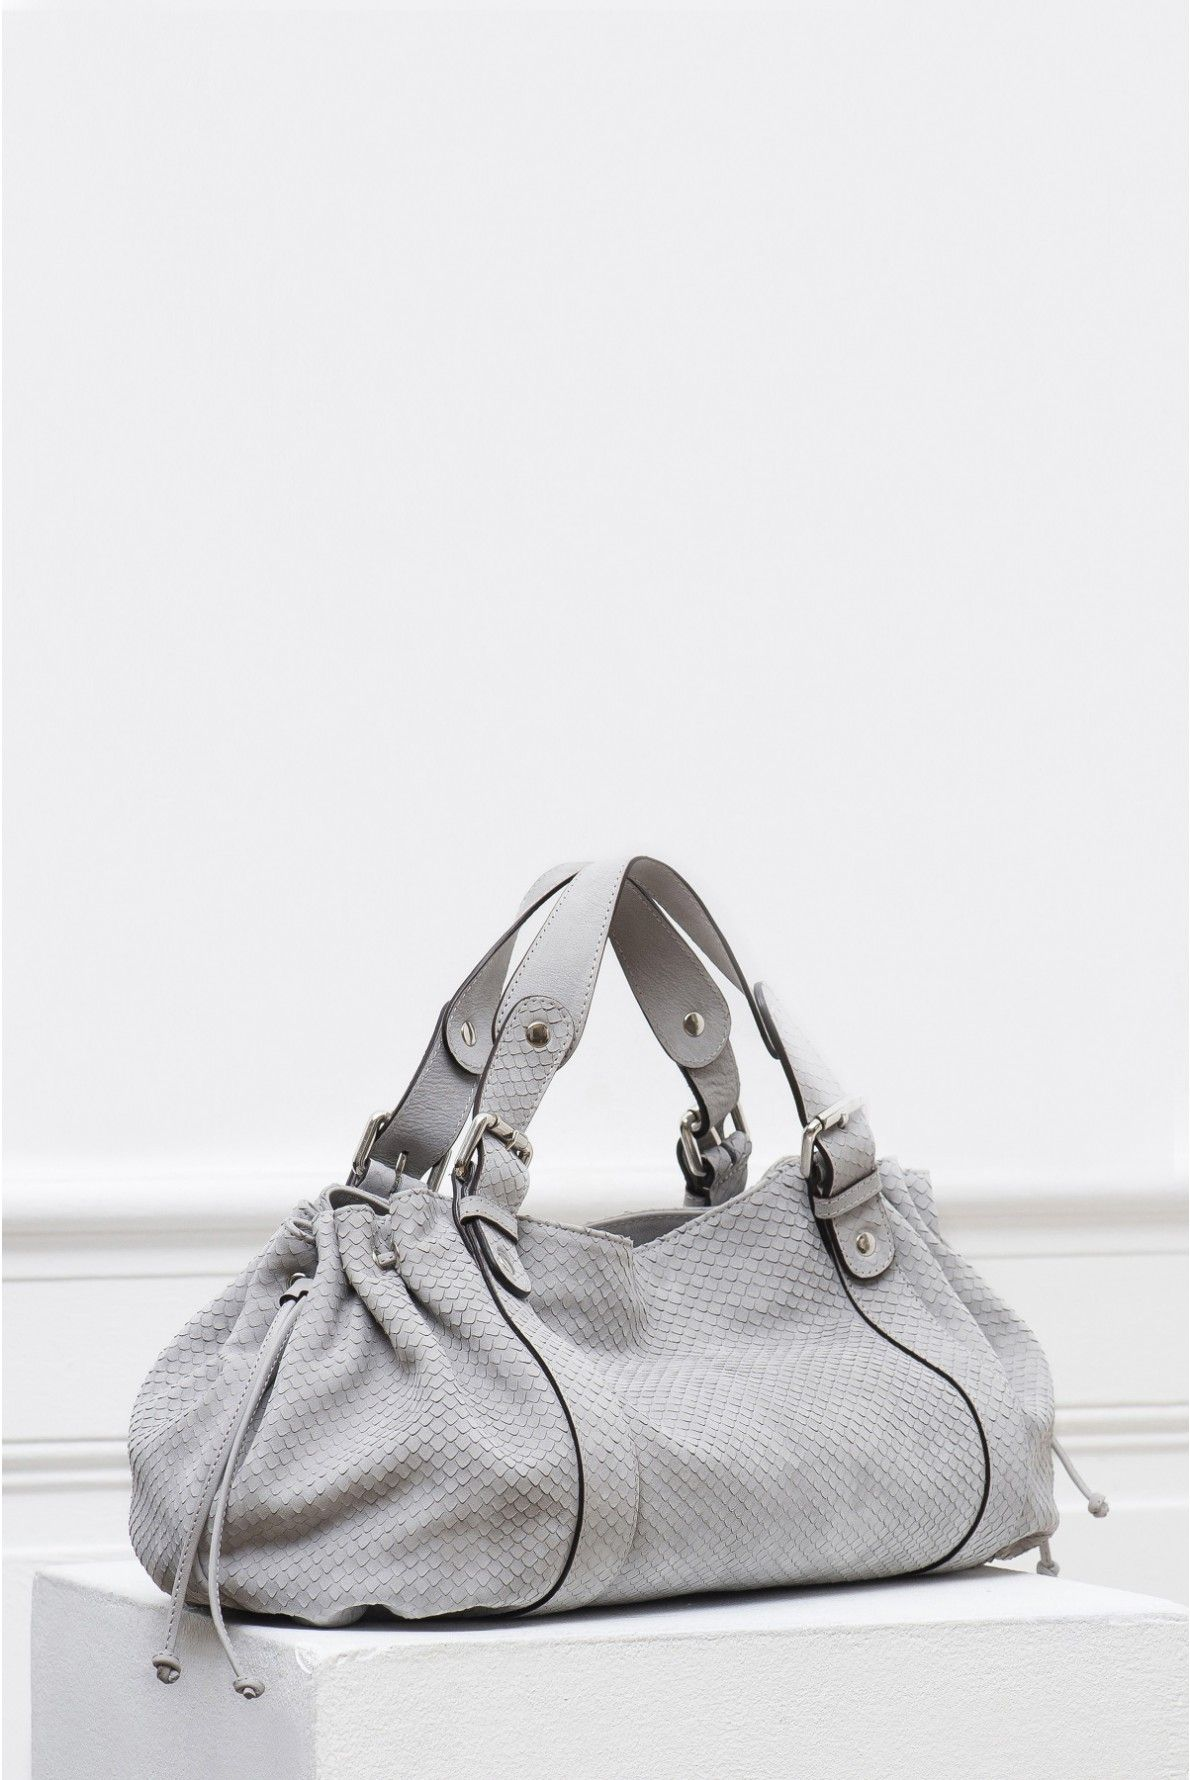 173860d1ac Le 24 heures zippé, sac gris | gerard darel | bags en 2019 | Bags ...